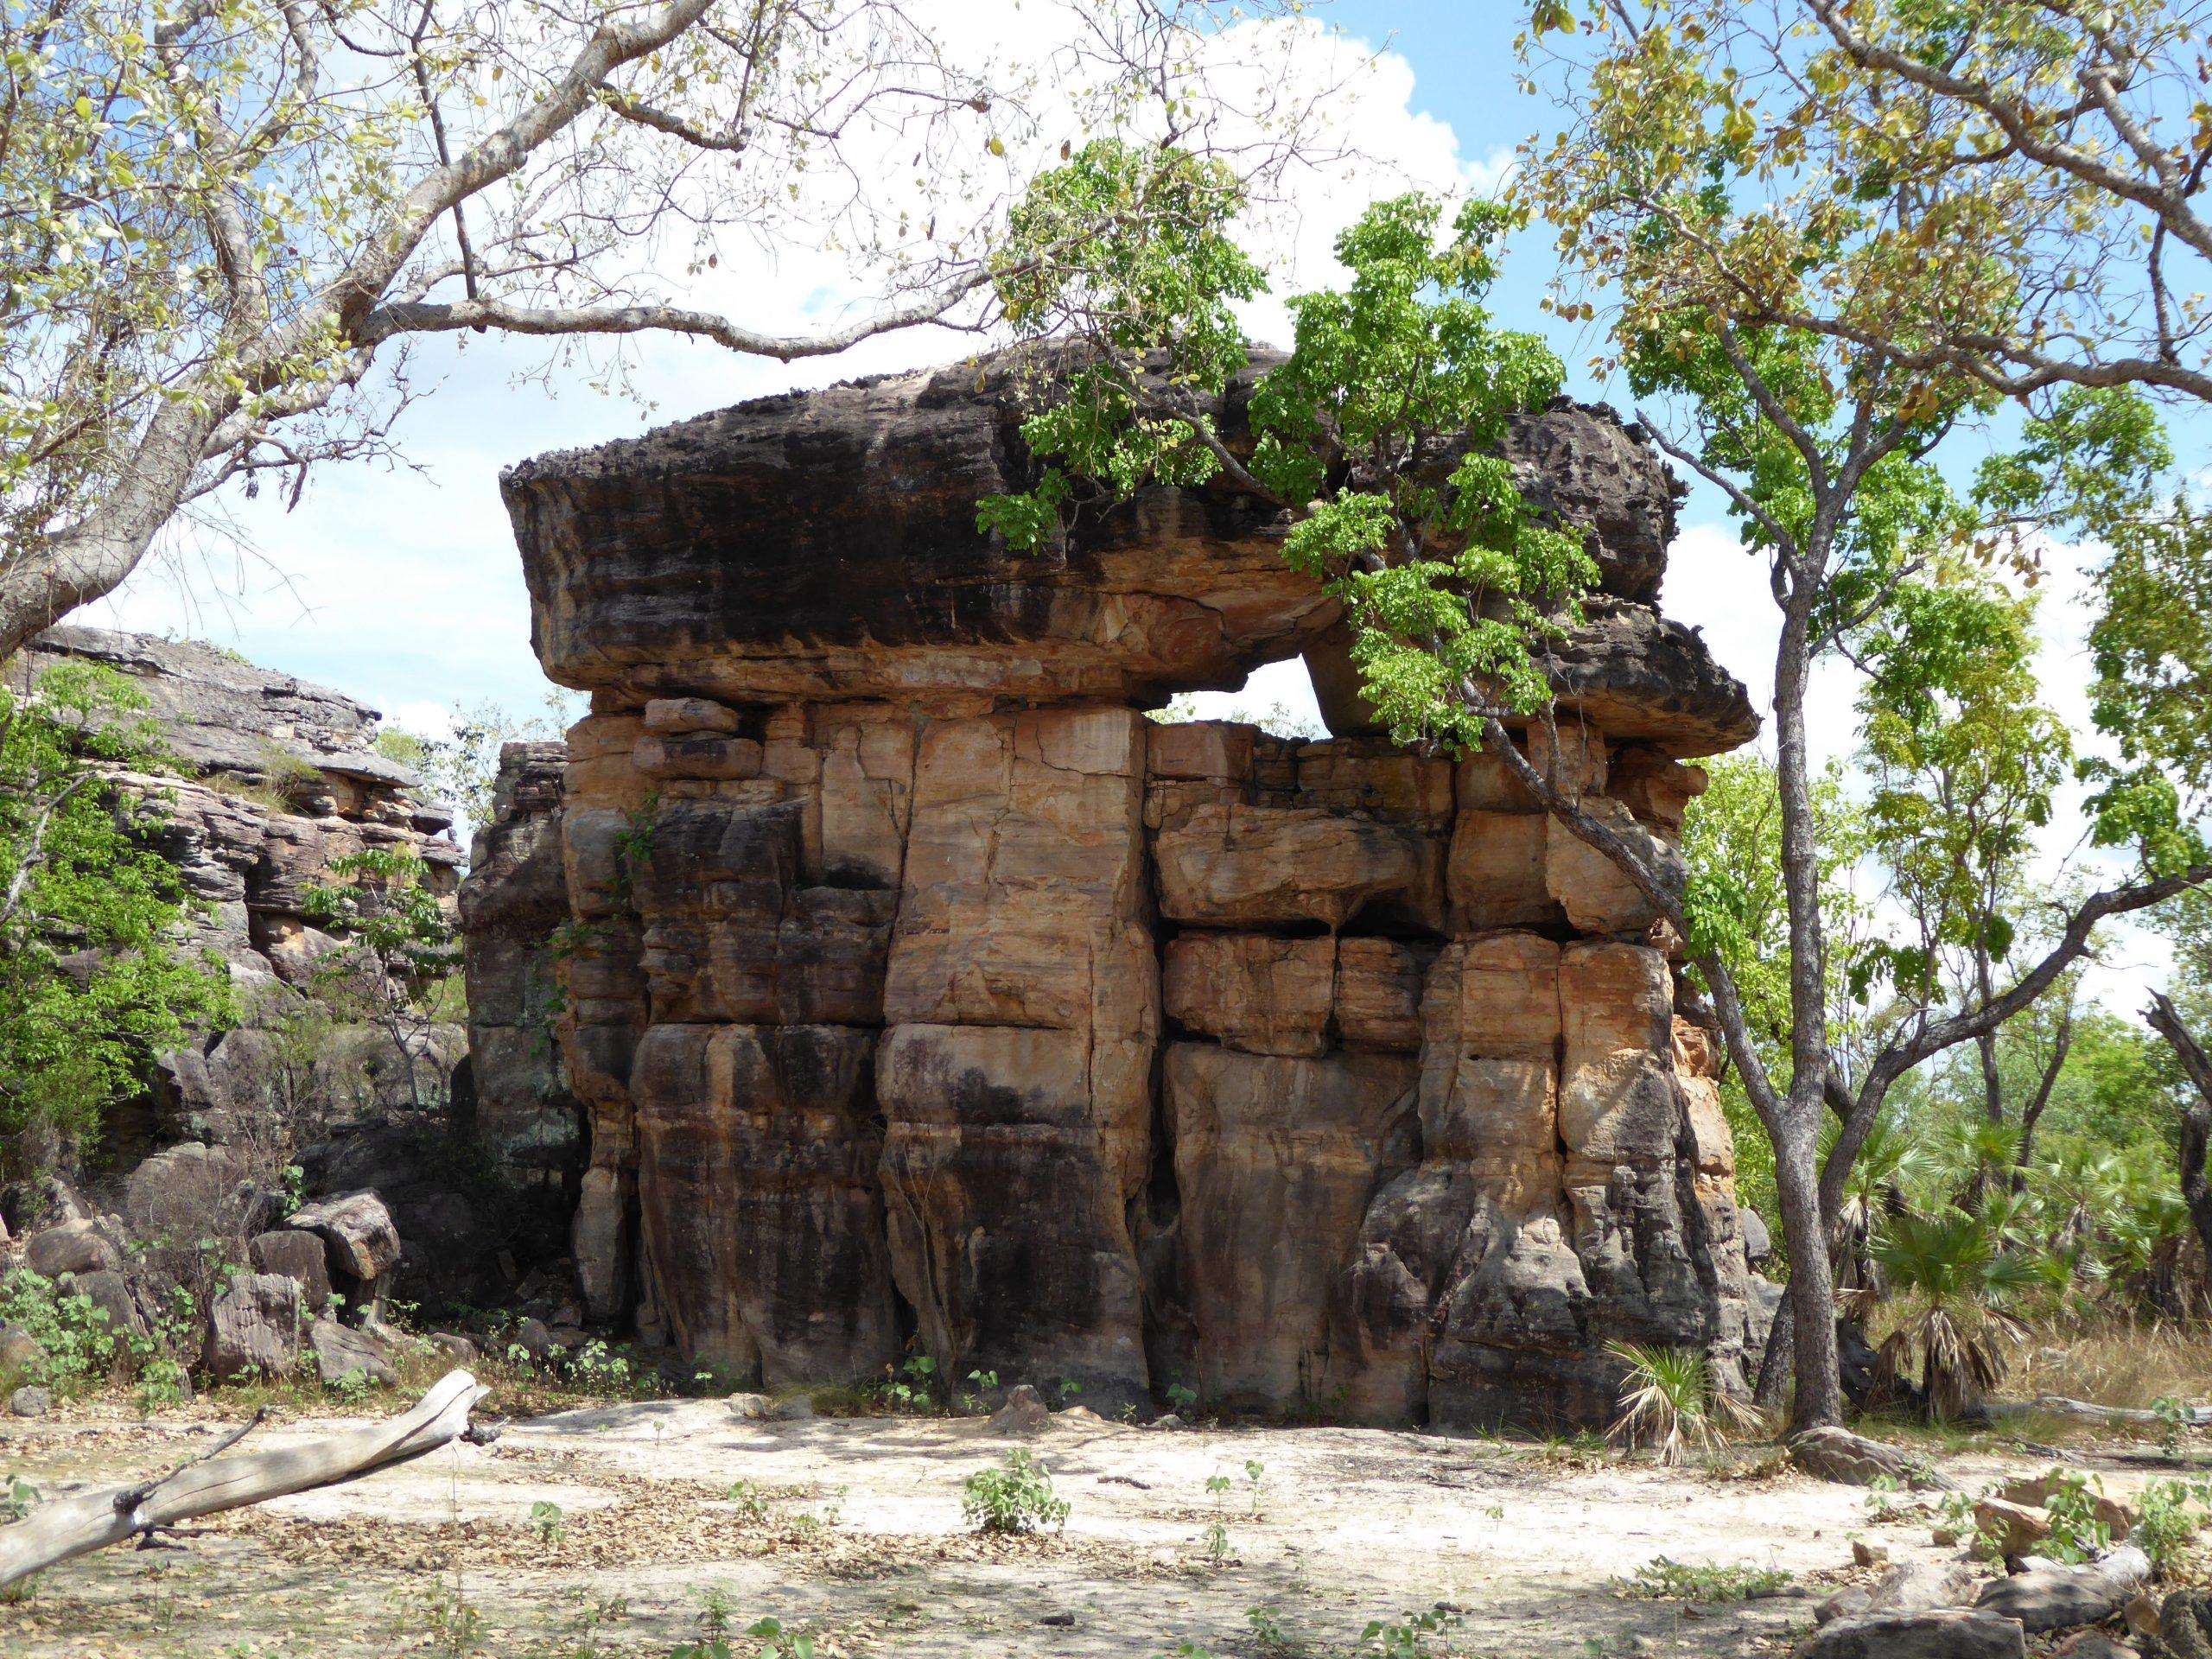 Radreise Australien 2016 - Kakadu NP - Felsturm